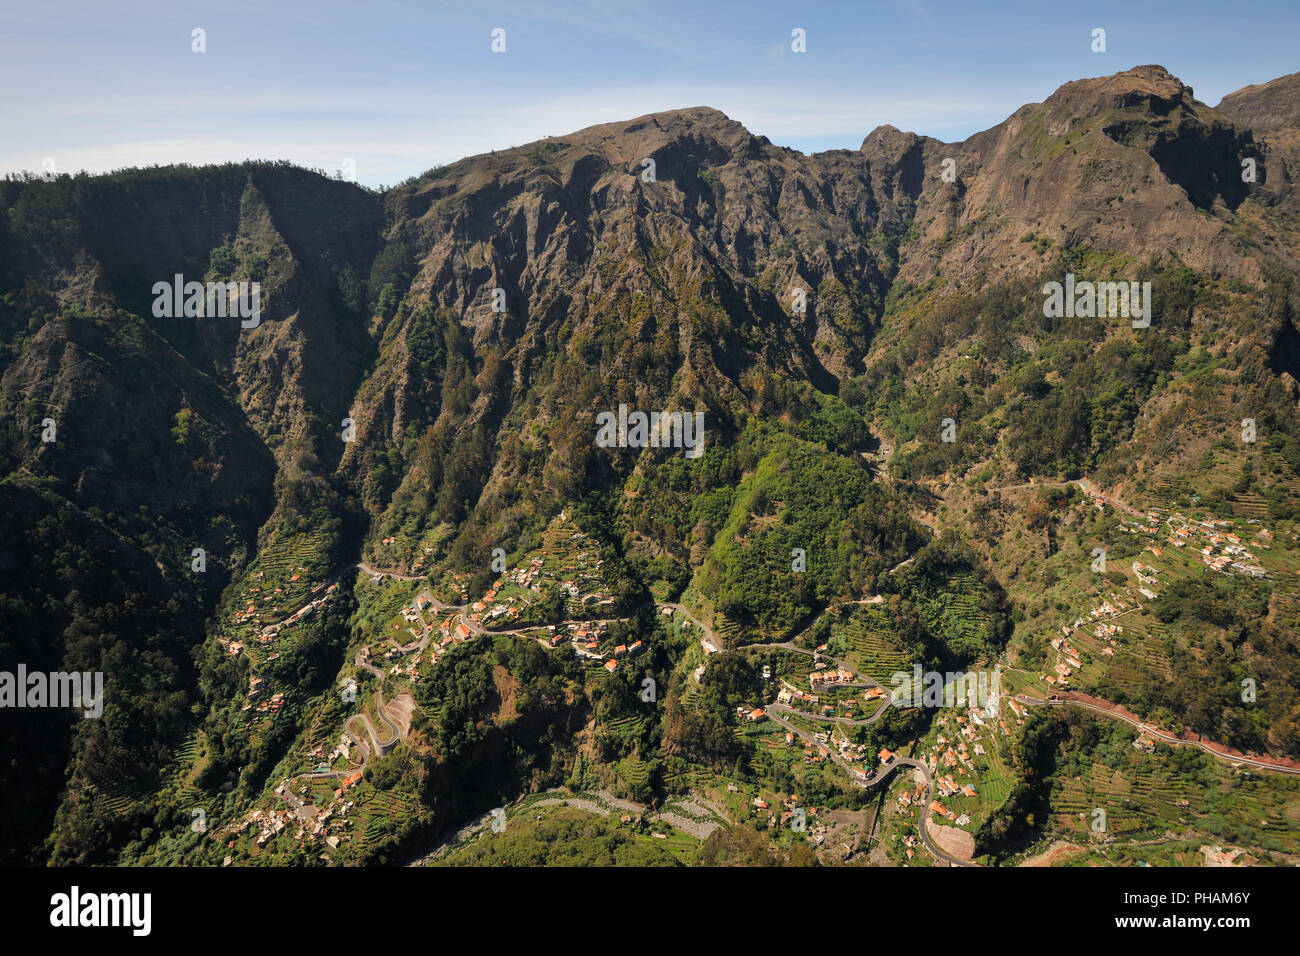 Curral das Freiras valley and village. Eira do Serrado. Madeira island, Portugal - Stock Image